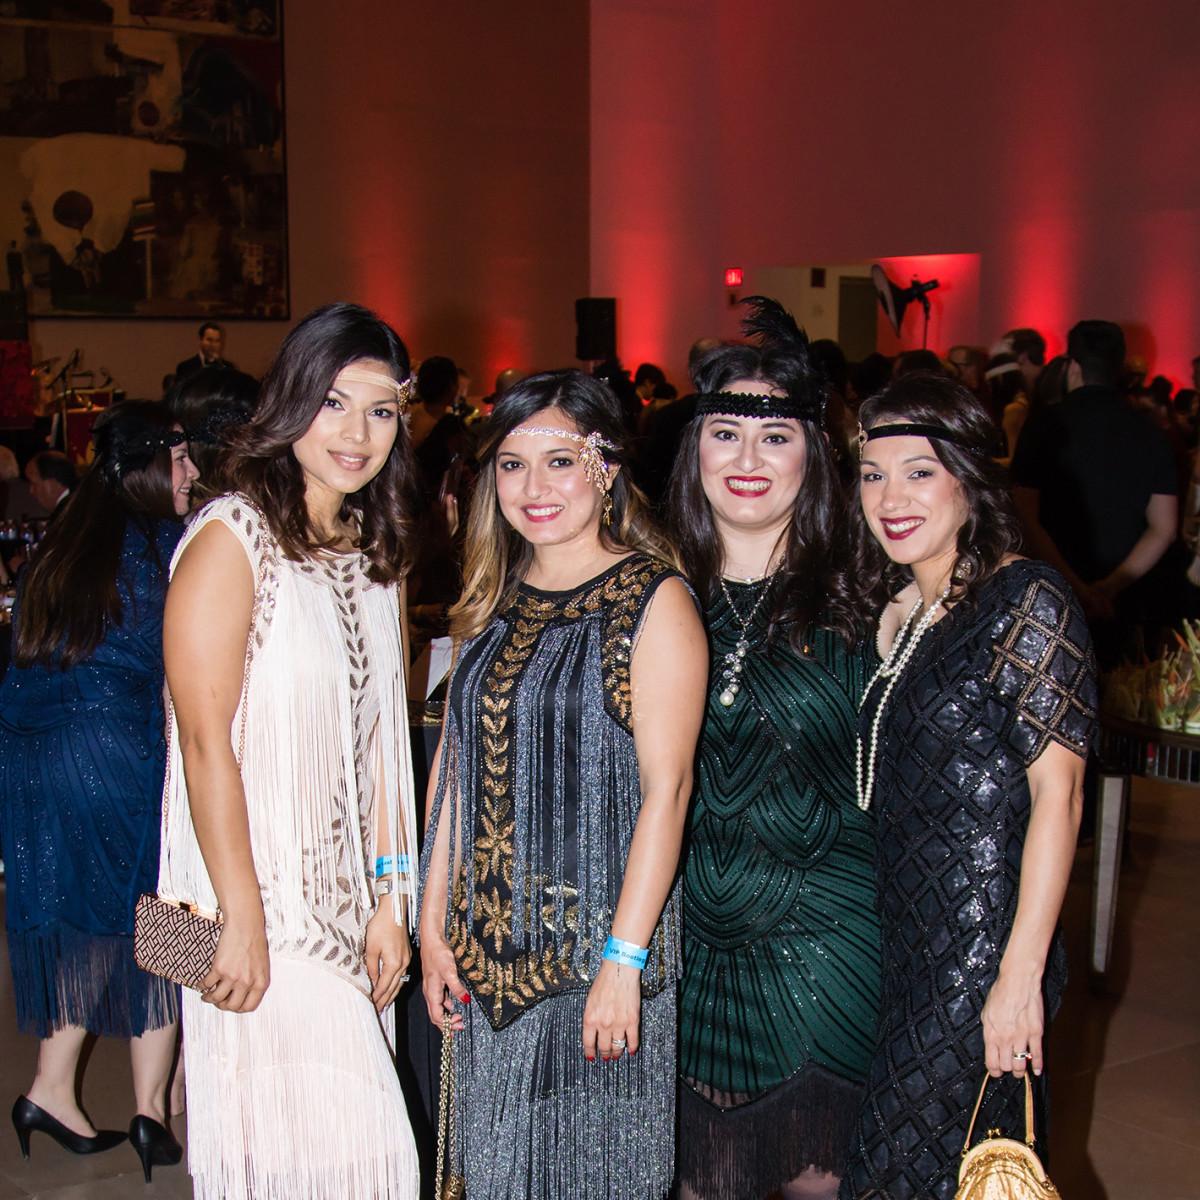 Manuela Del Toro, Dora Del Toro, Nicole Lawrence, Sylvia Del Toro